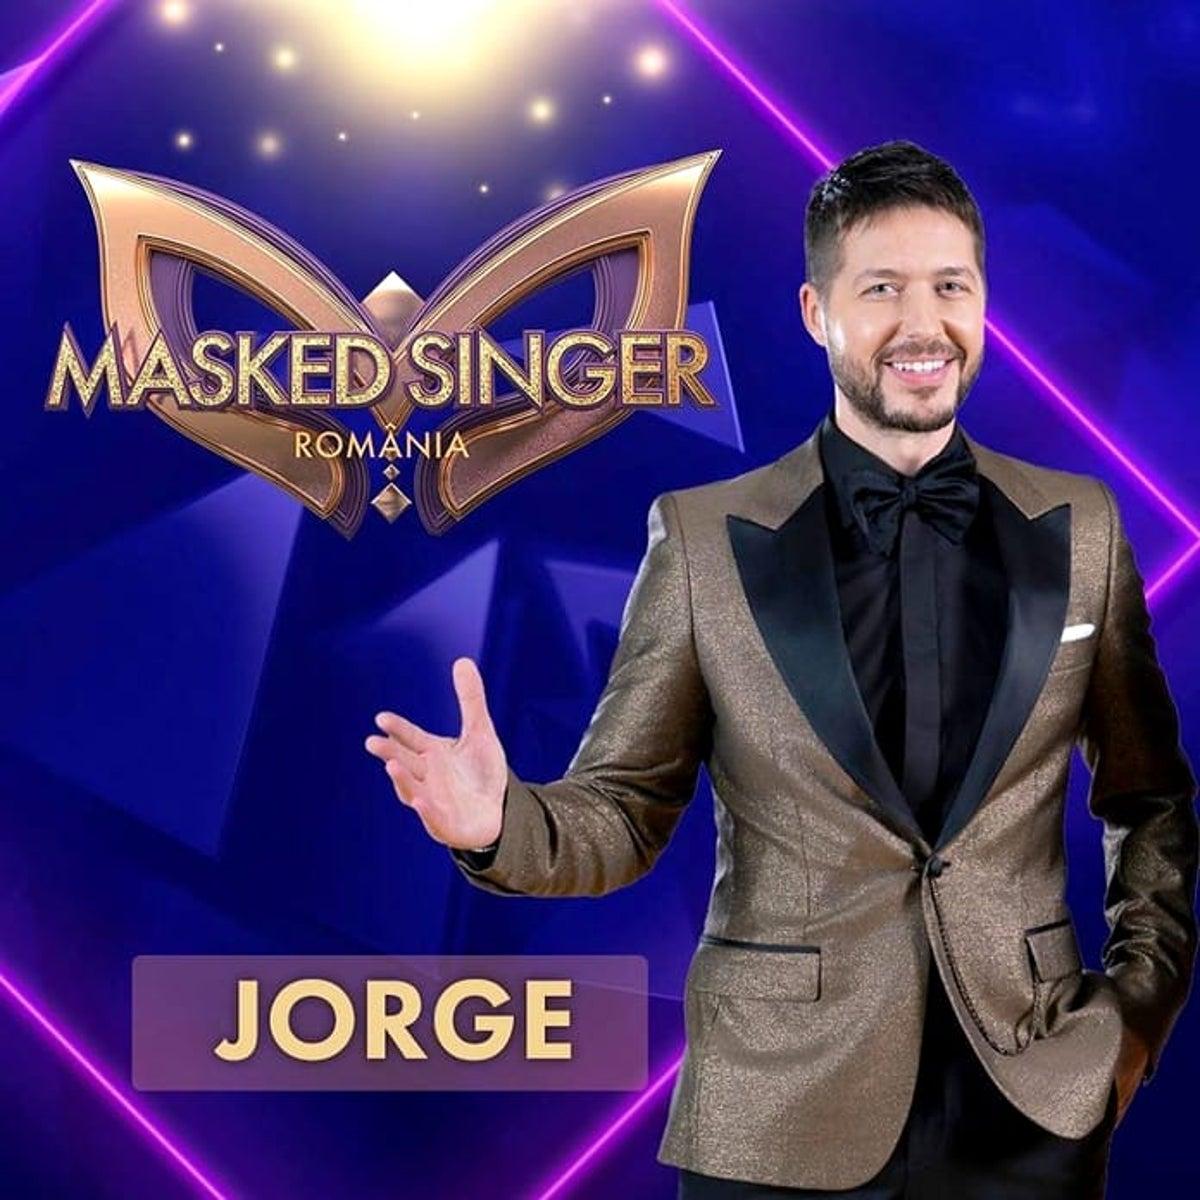 Masked Singer România - Hristos a inviat! | Facebook  |Masked Singer Romania